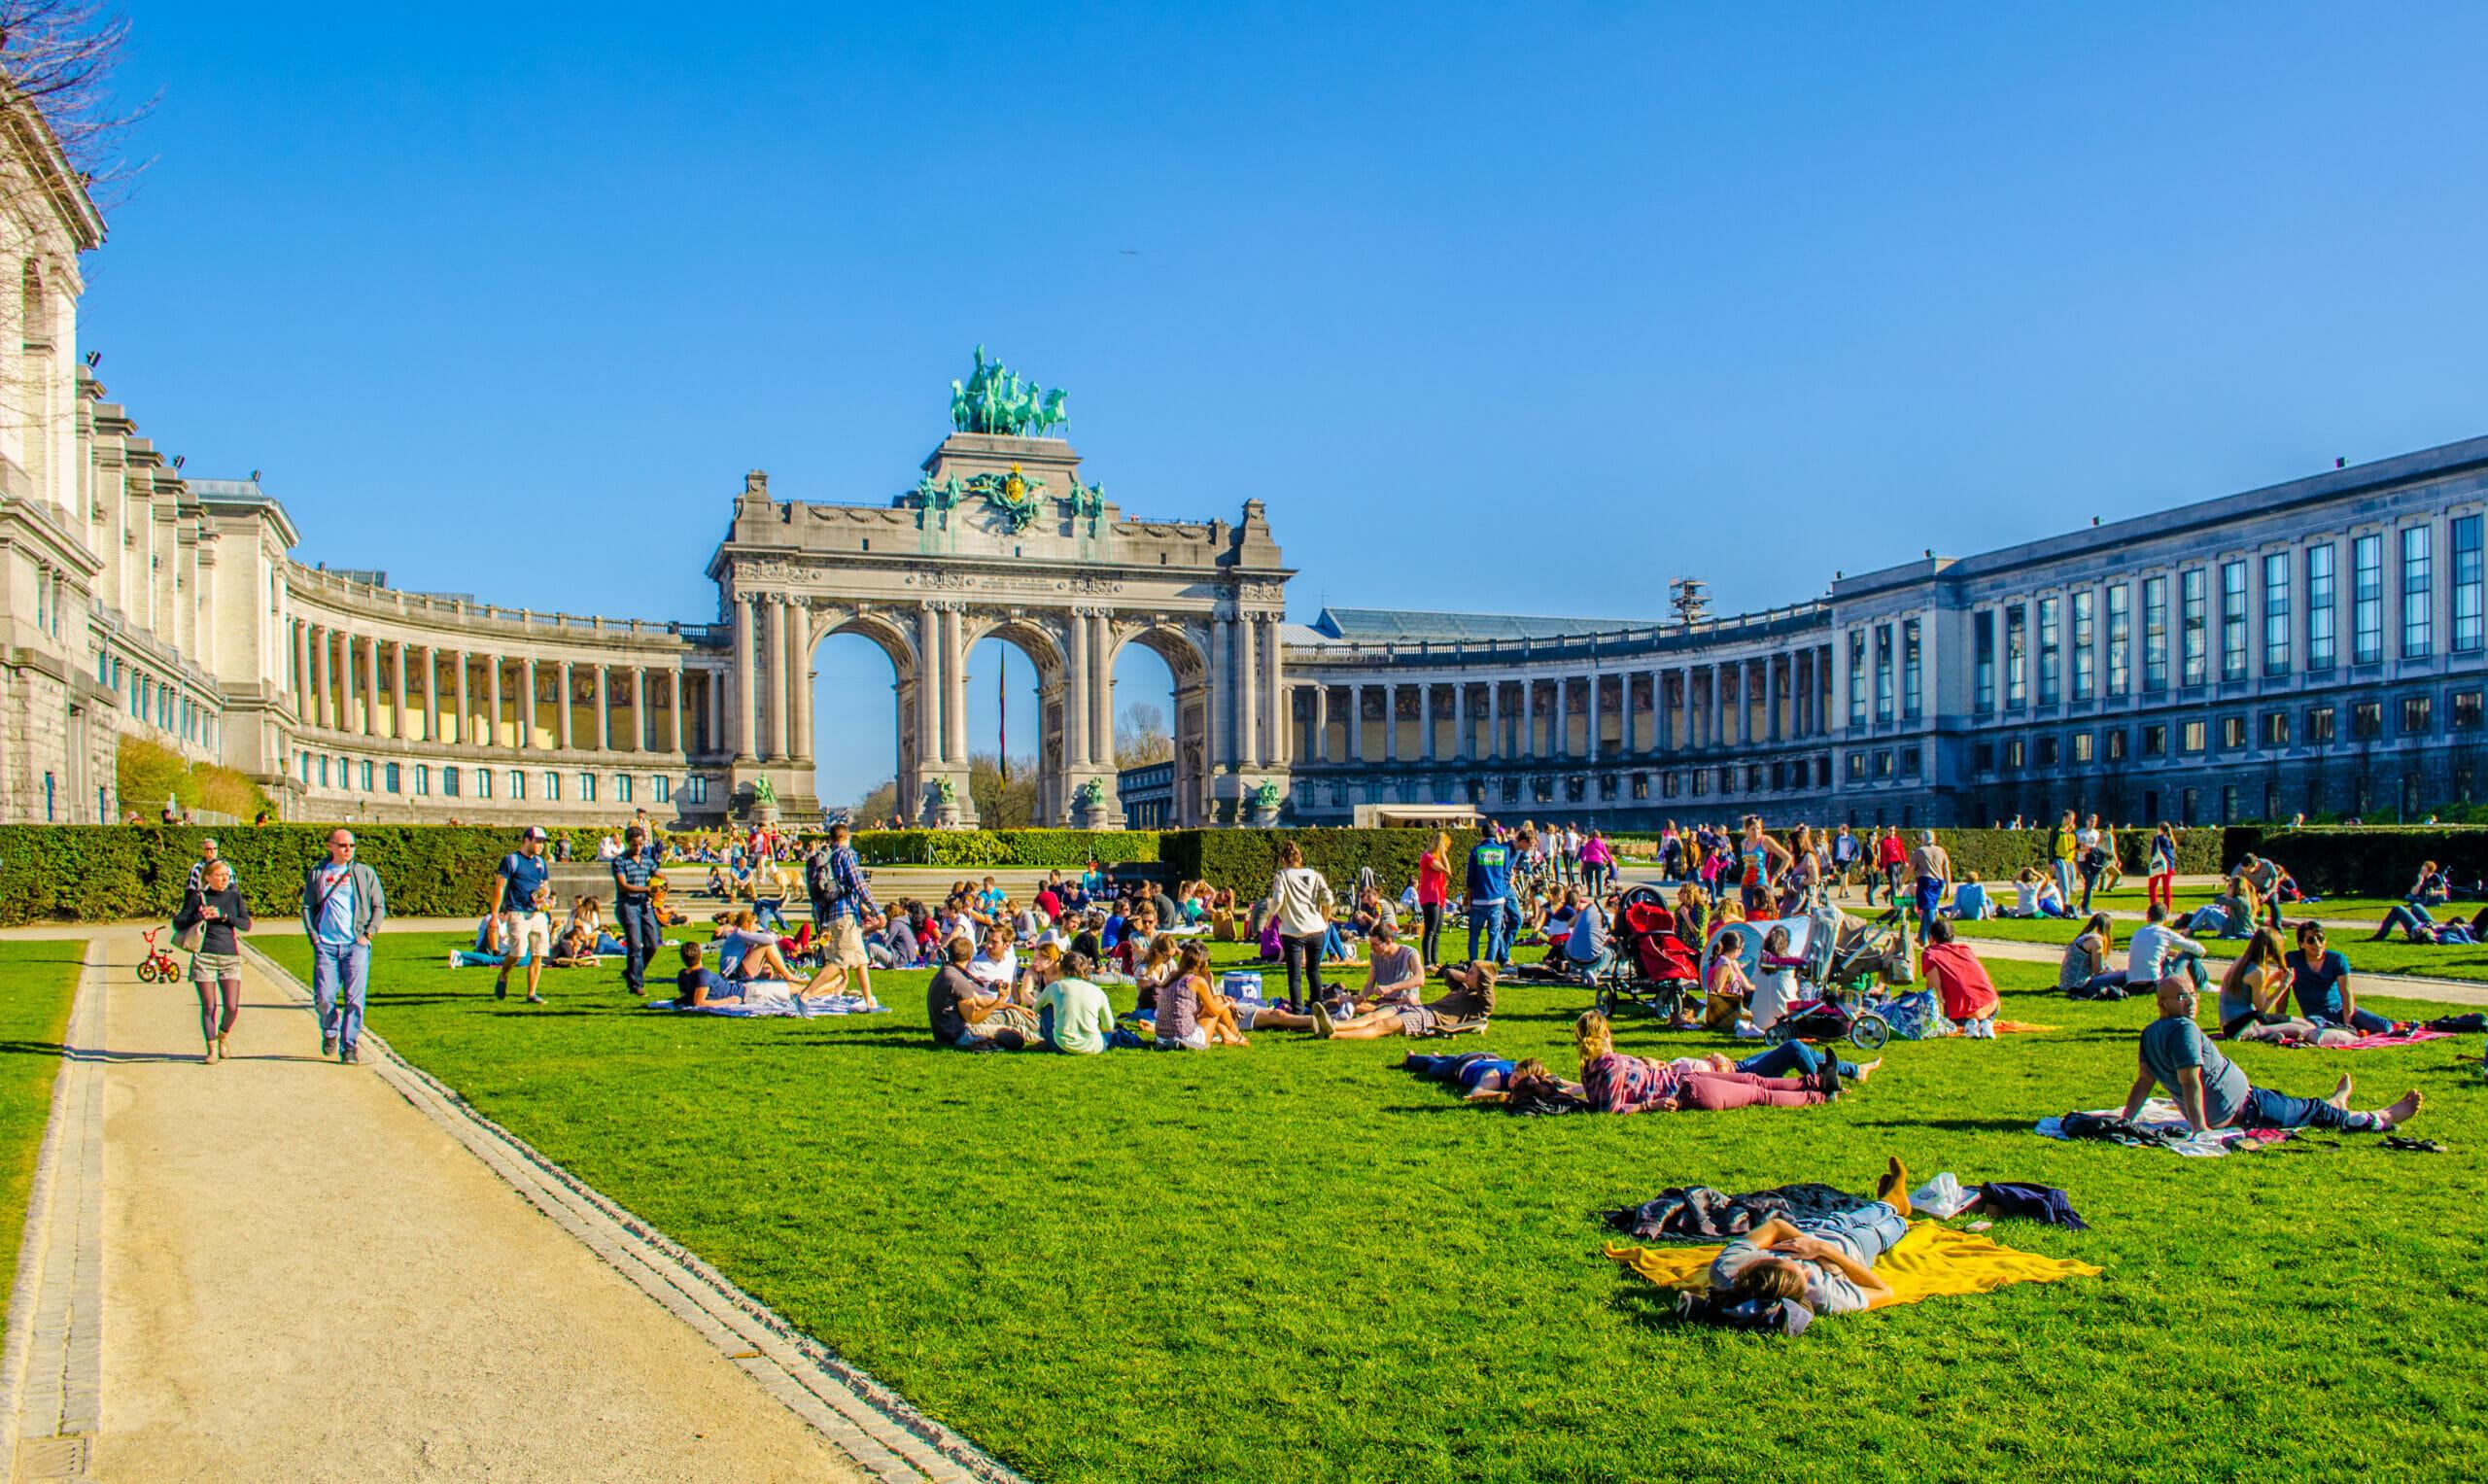 American tourists in the EU